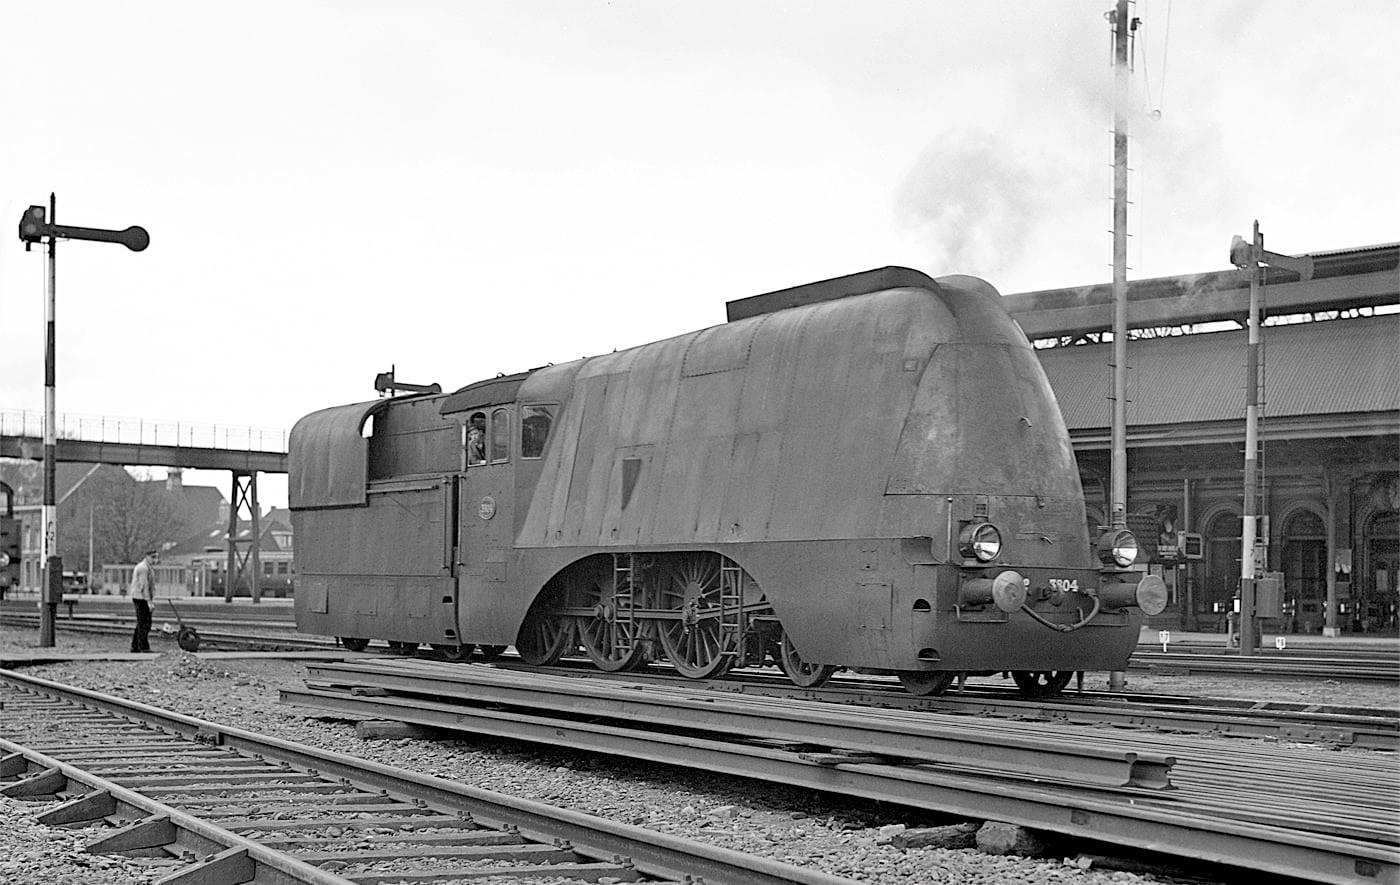 Zwolle-NS-3804-4-6-0-Henschel---Sohn-Kassel-1920---1939-